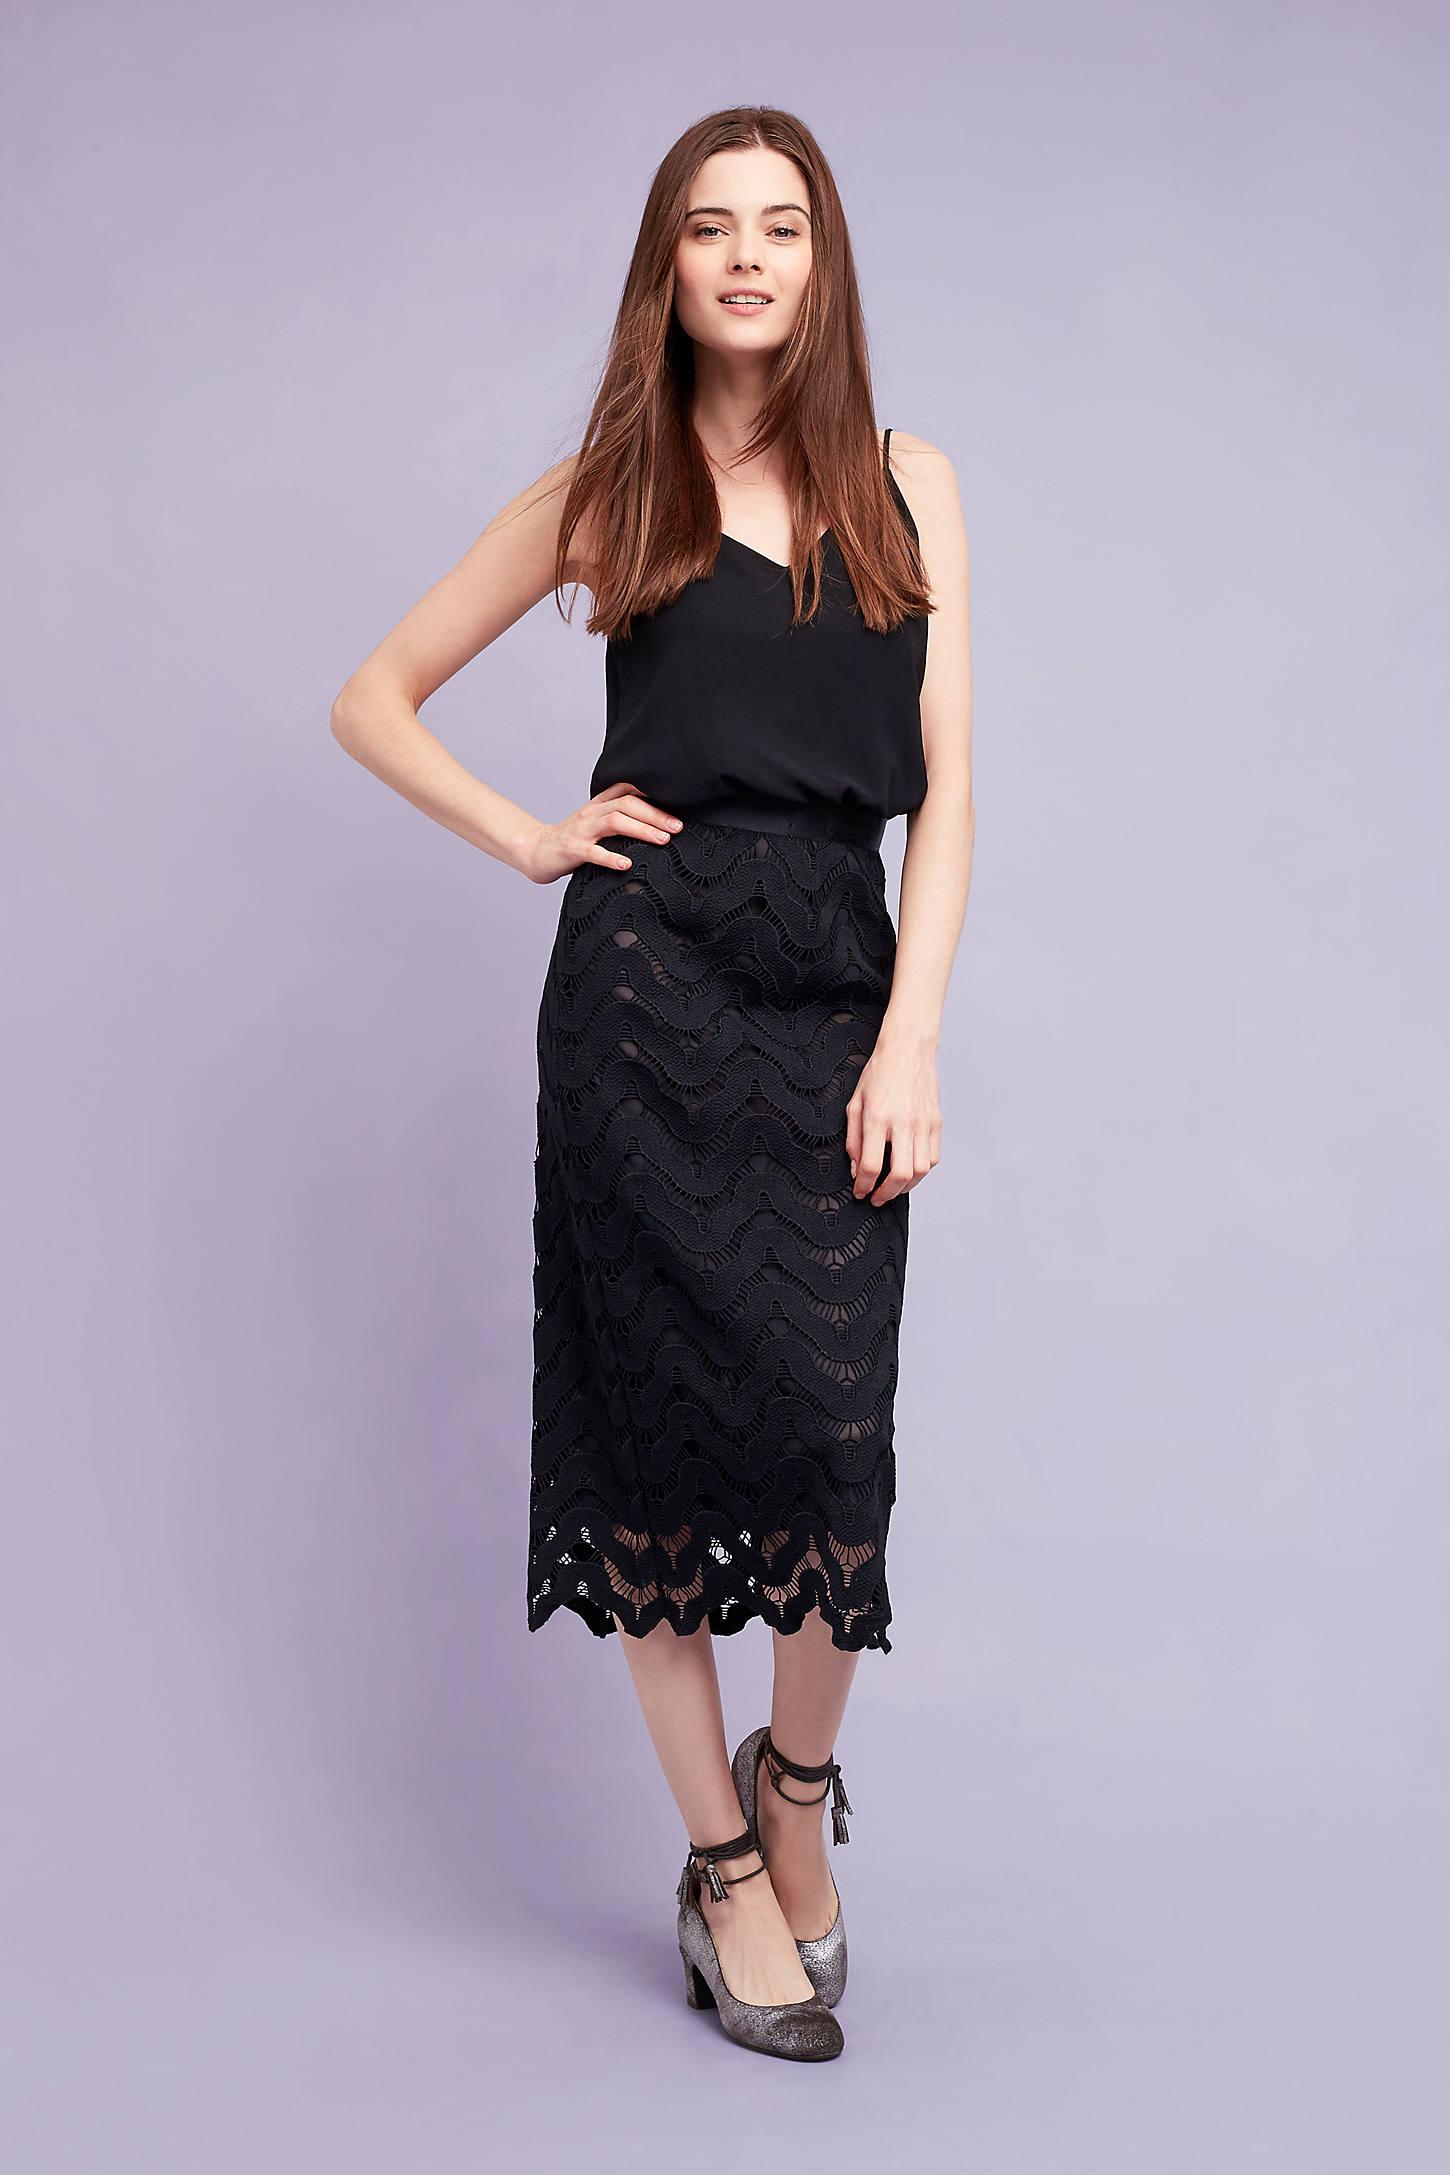 Nonante Lace Dress